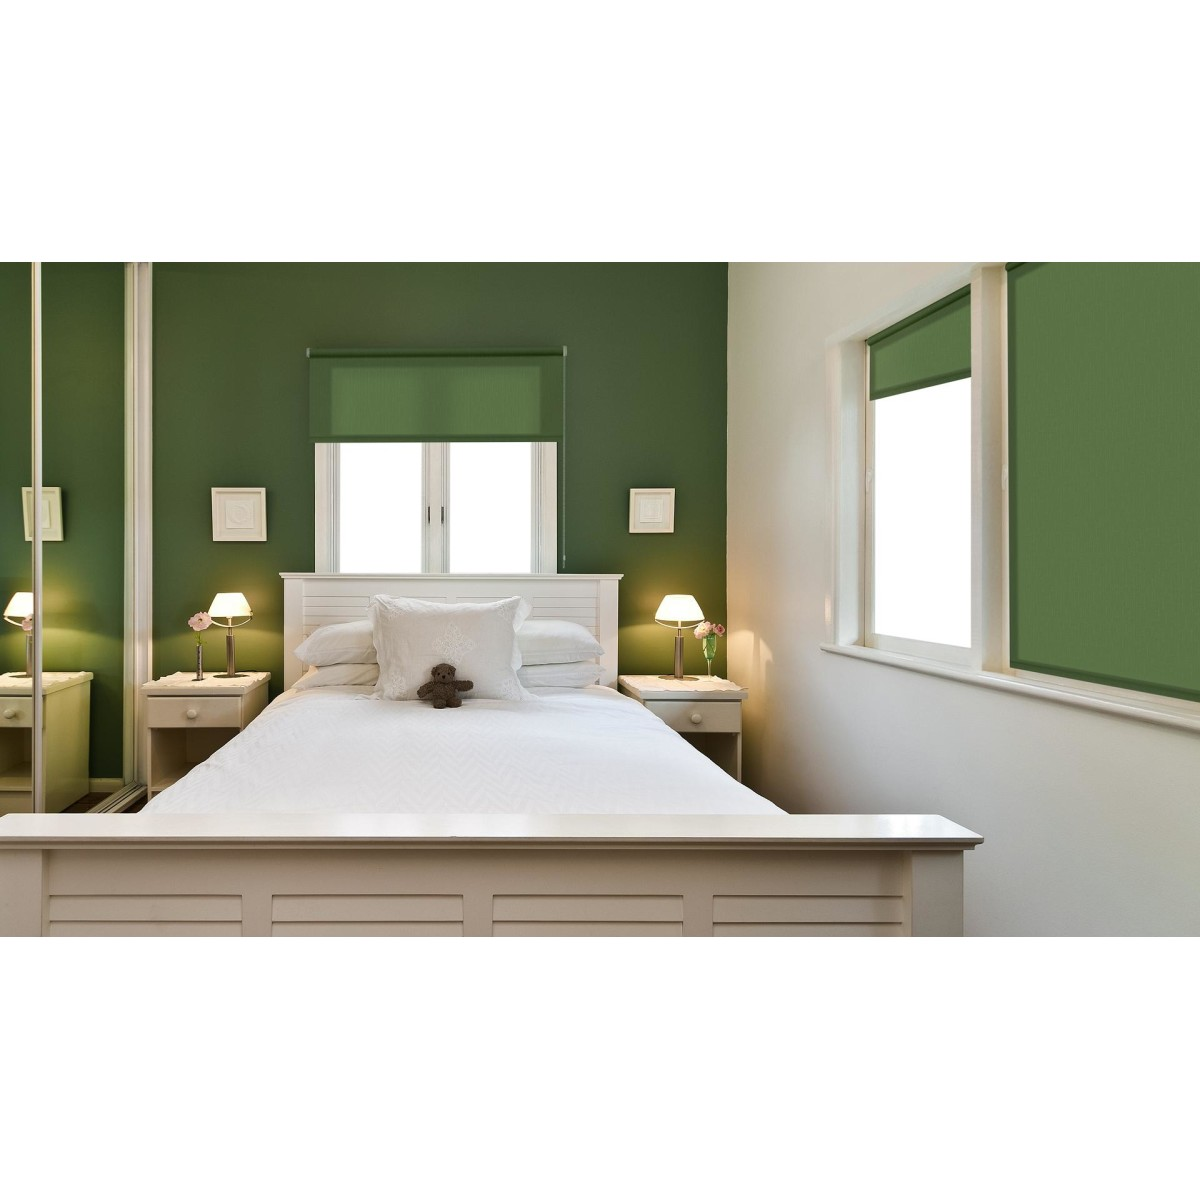 Рулонная Ора Decofest Апилера 80Х160 Цвет Зеленый